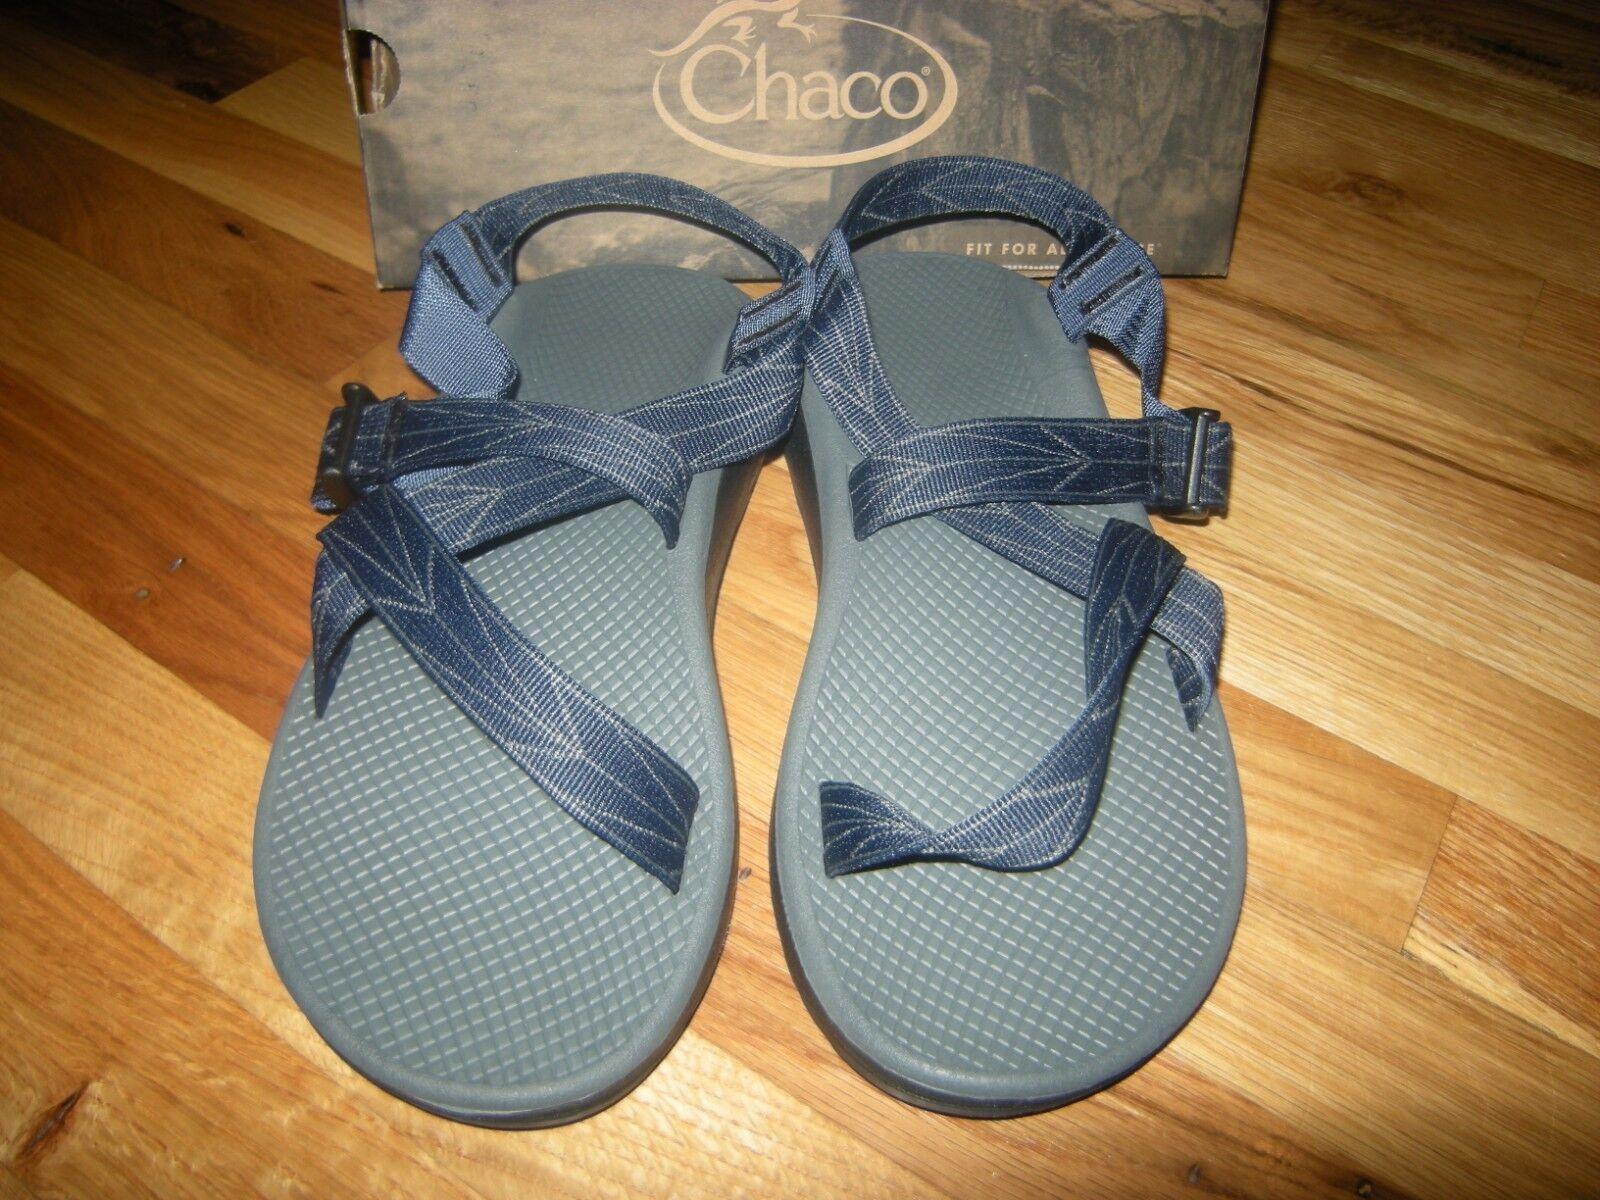 Totalmente Nuevo Para Hombres Sandalias Chaco zcloud Aero azul, tamaño 12 M